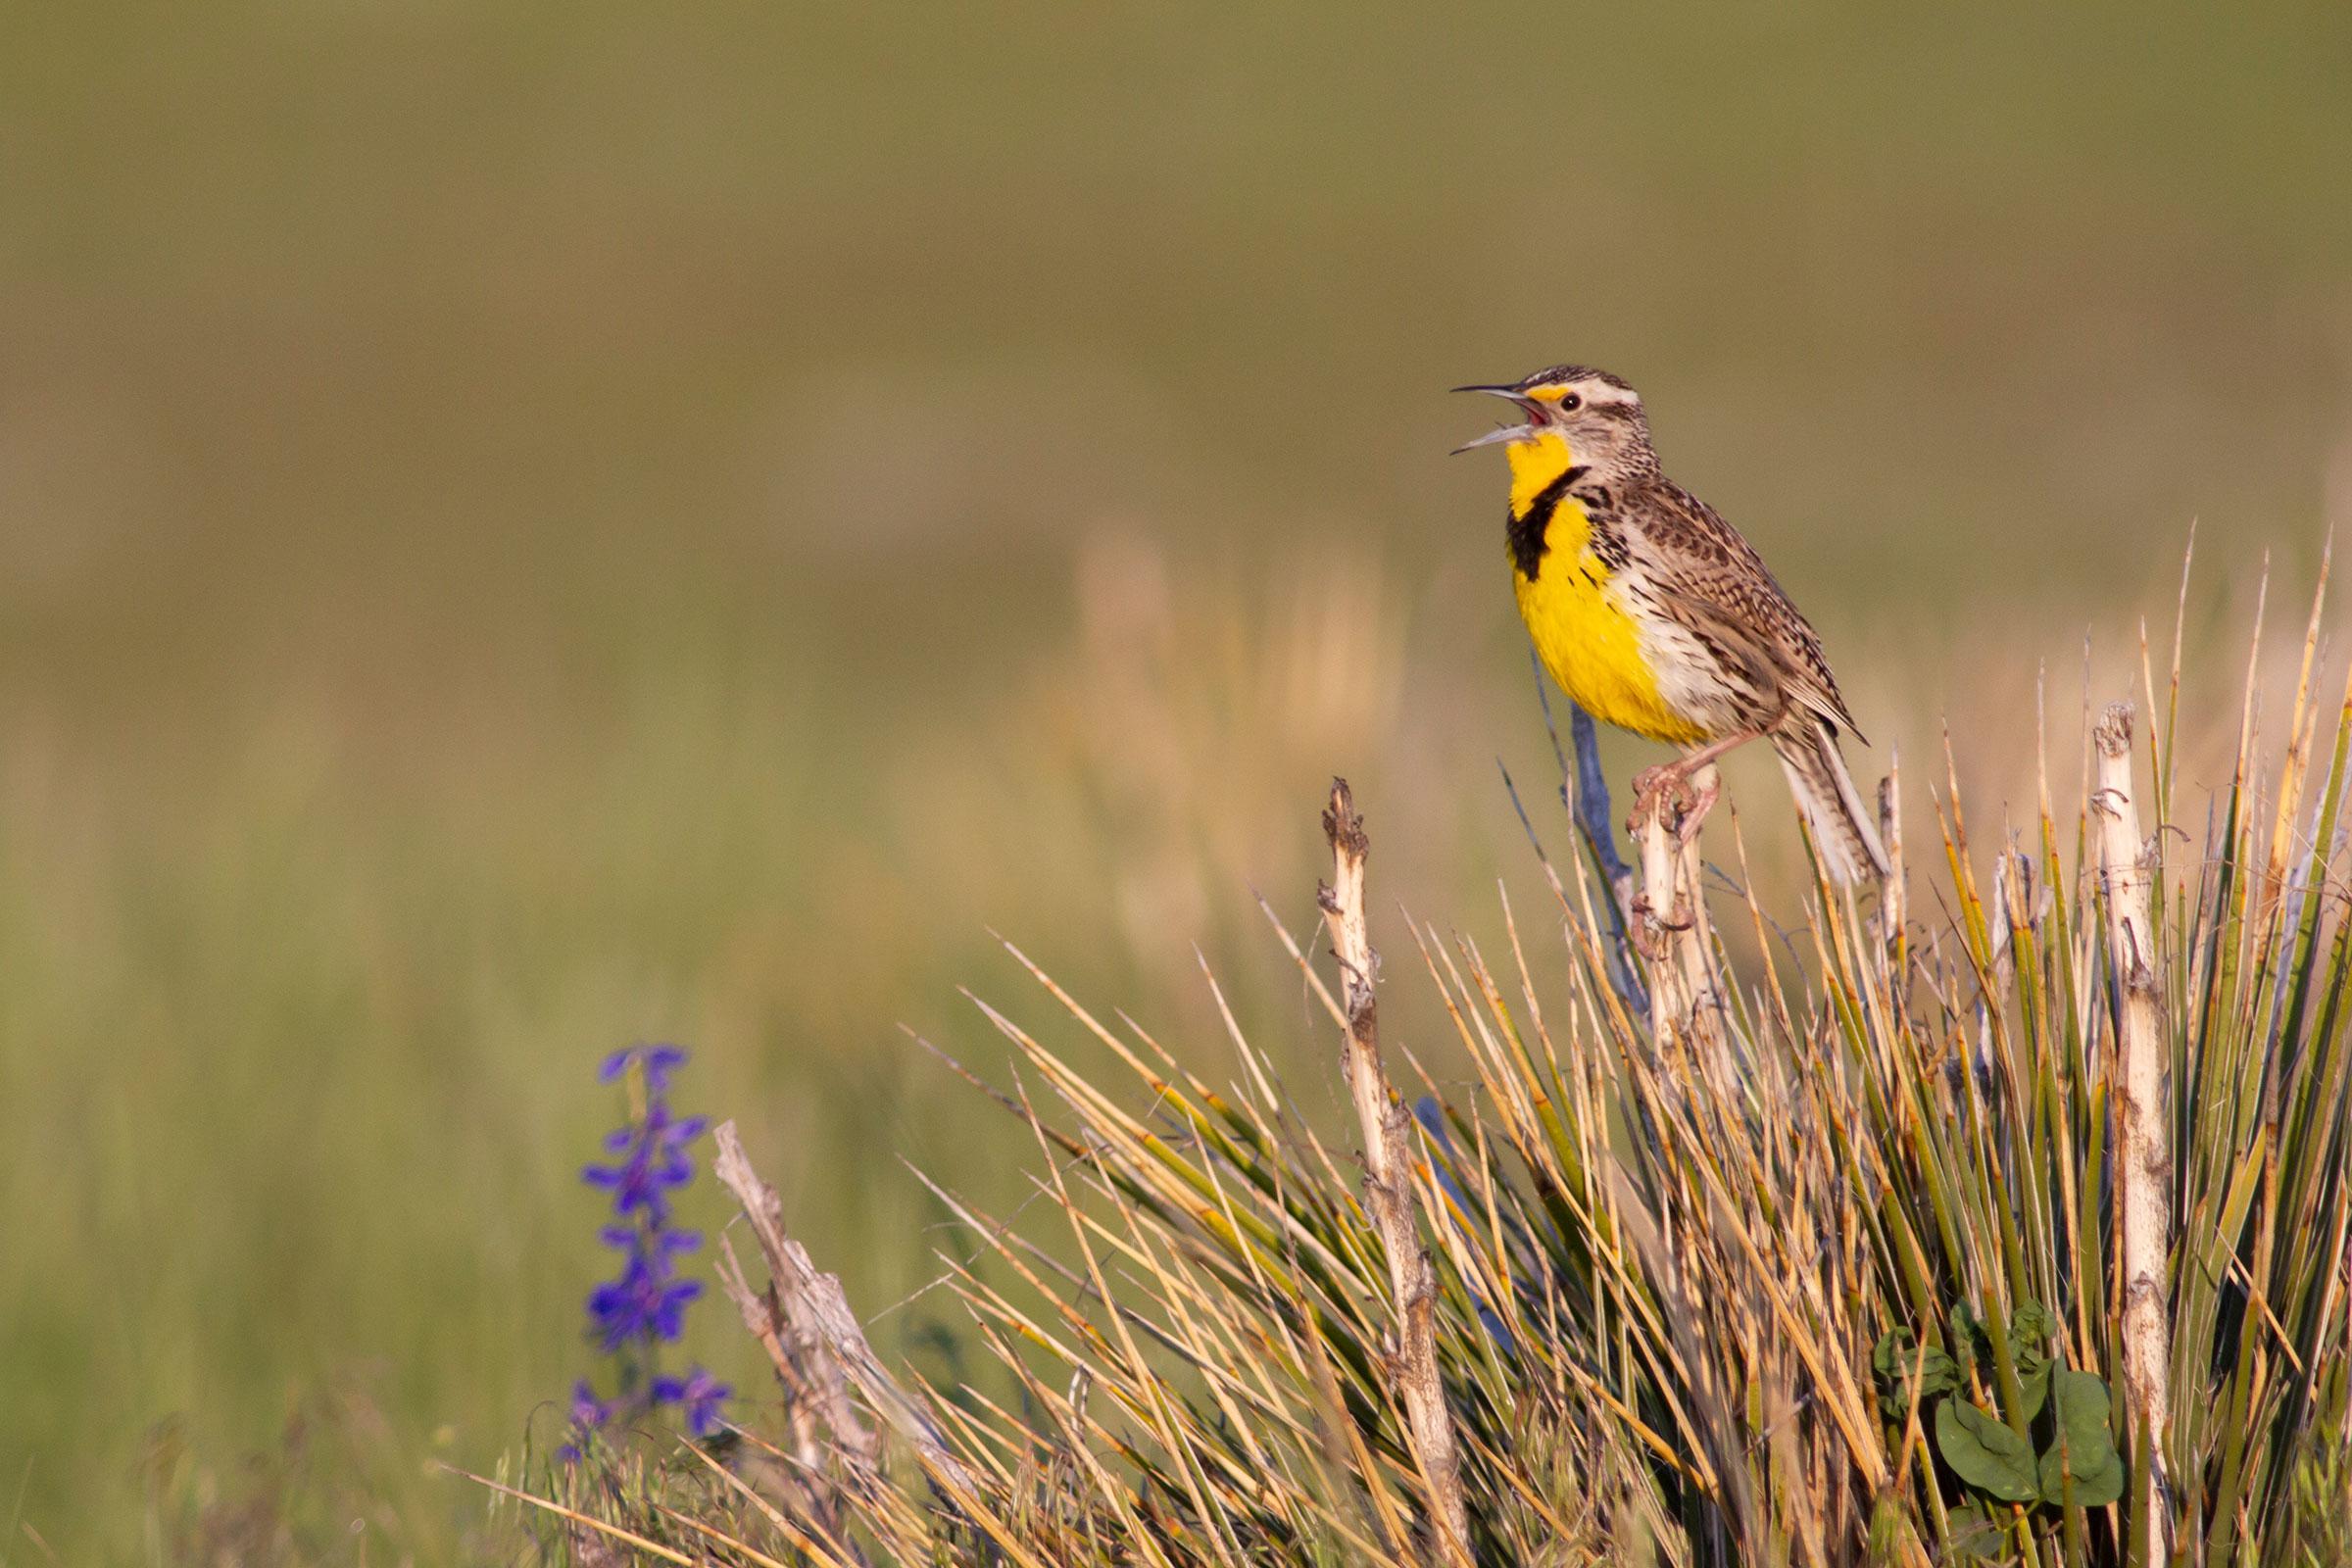 Western Meadowlark, Pronghorn Ranch, Wyoming, 18,000 acres enrolled in the Audubon Conservation Ranching Initiative. Evan Barrientos/Audubon